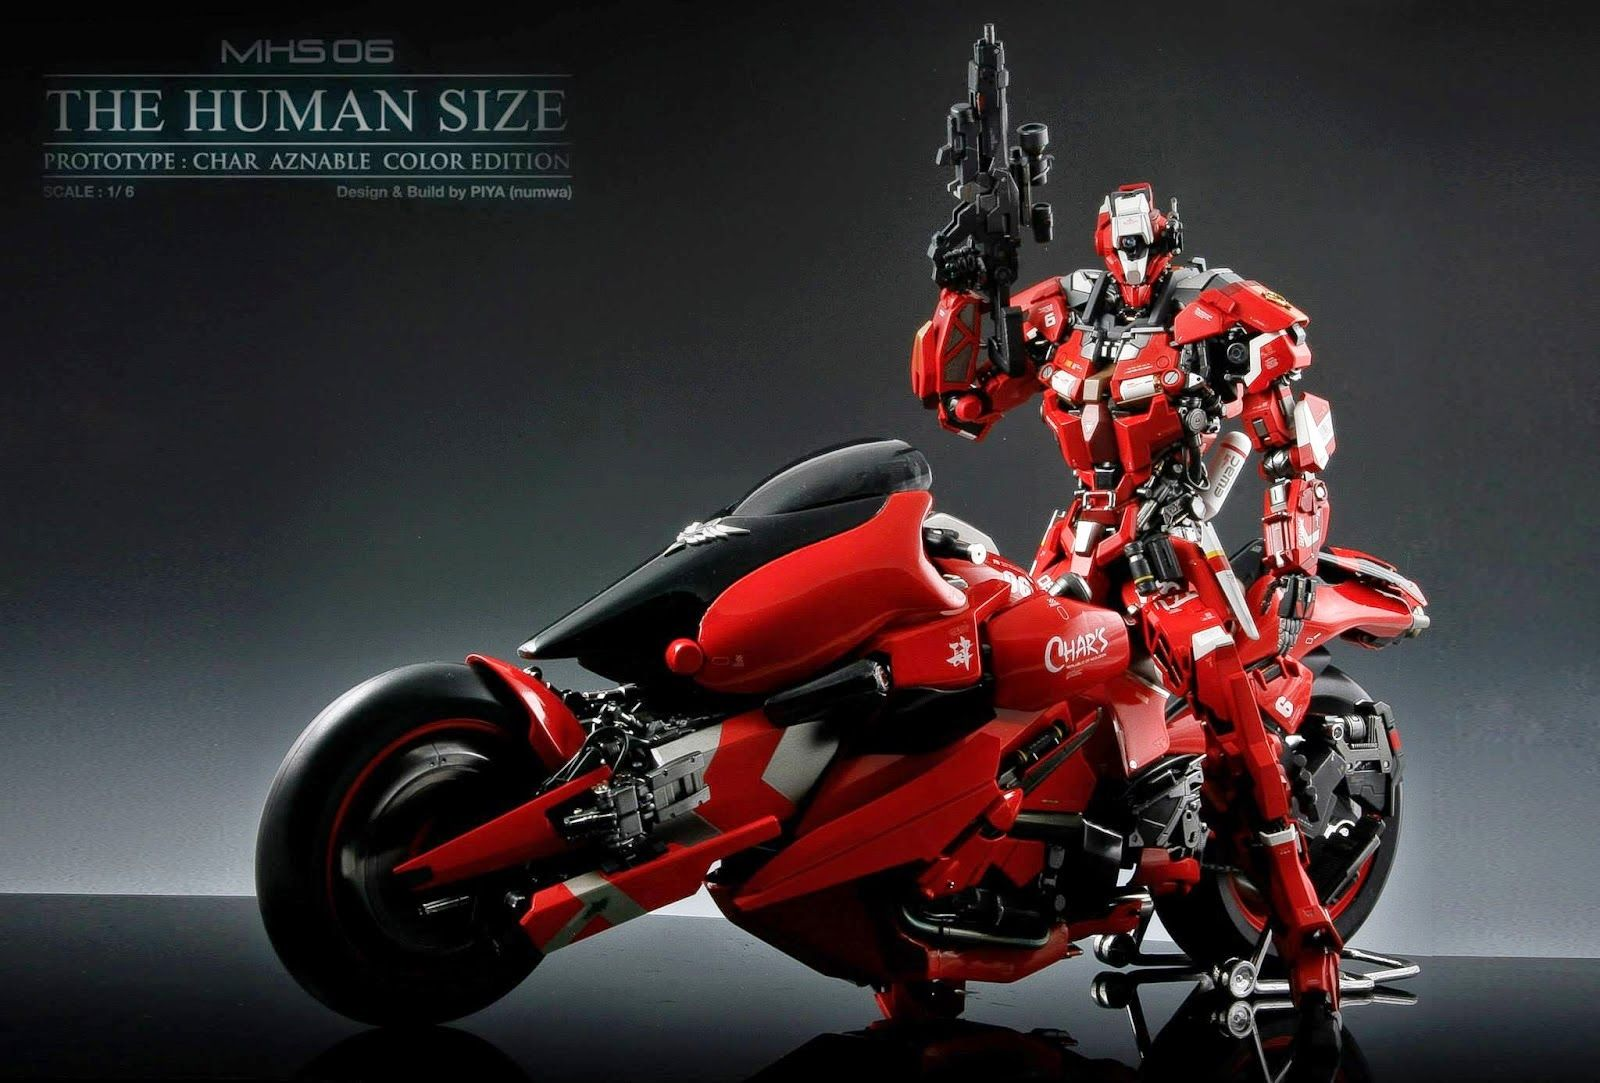 Gundam Guy 1 6 Scale Msh 06 The Humansize Custom Build Custom Build Robots Concept Dragon Ball Super Wallpapers